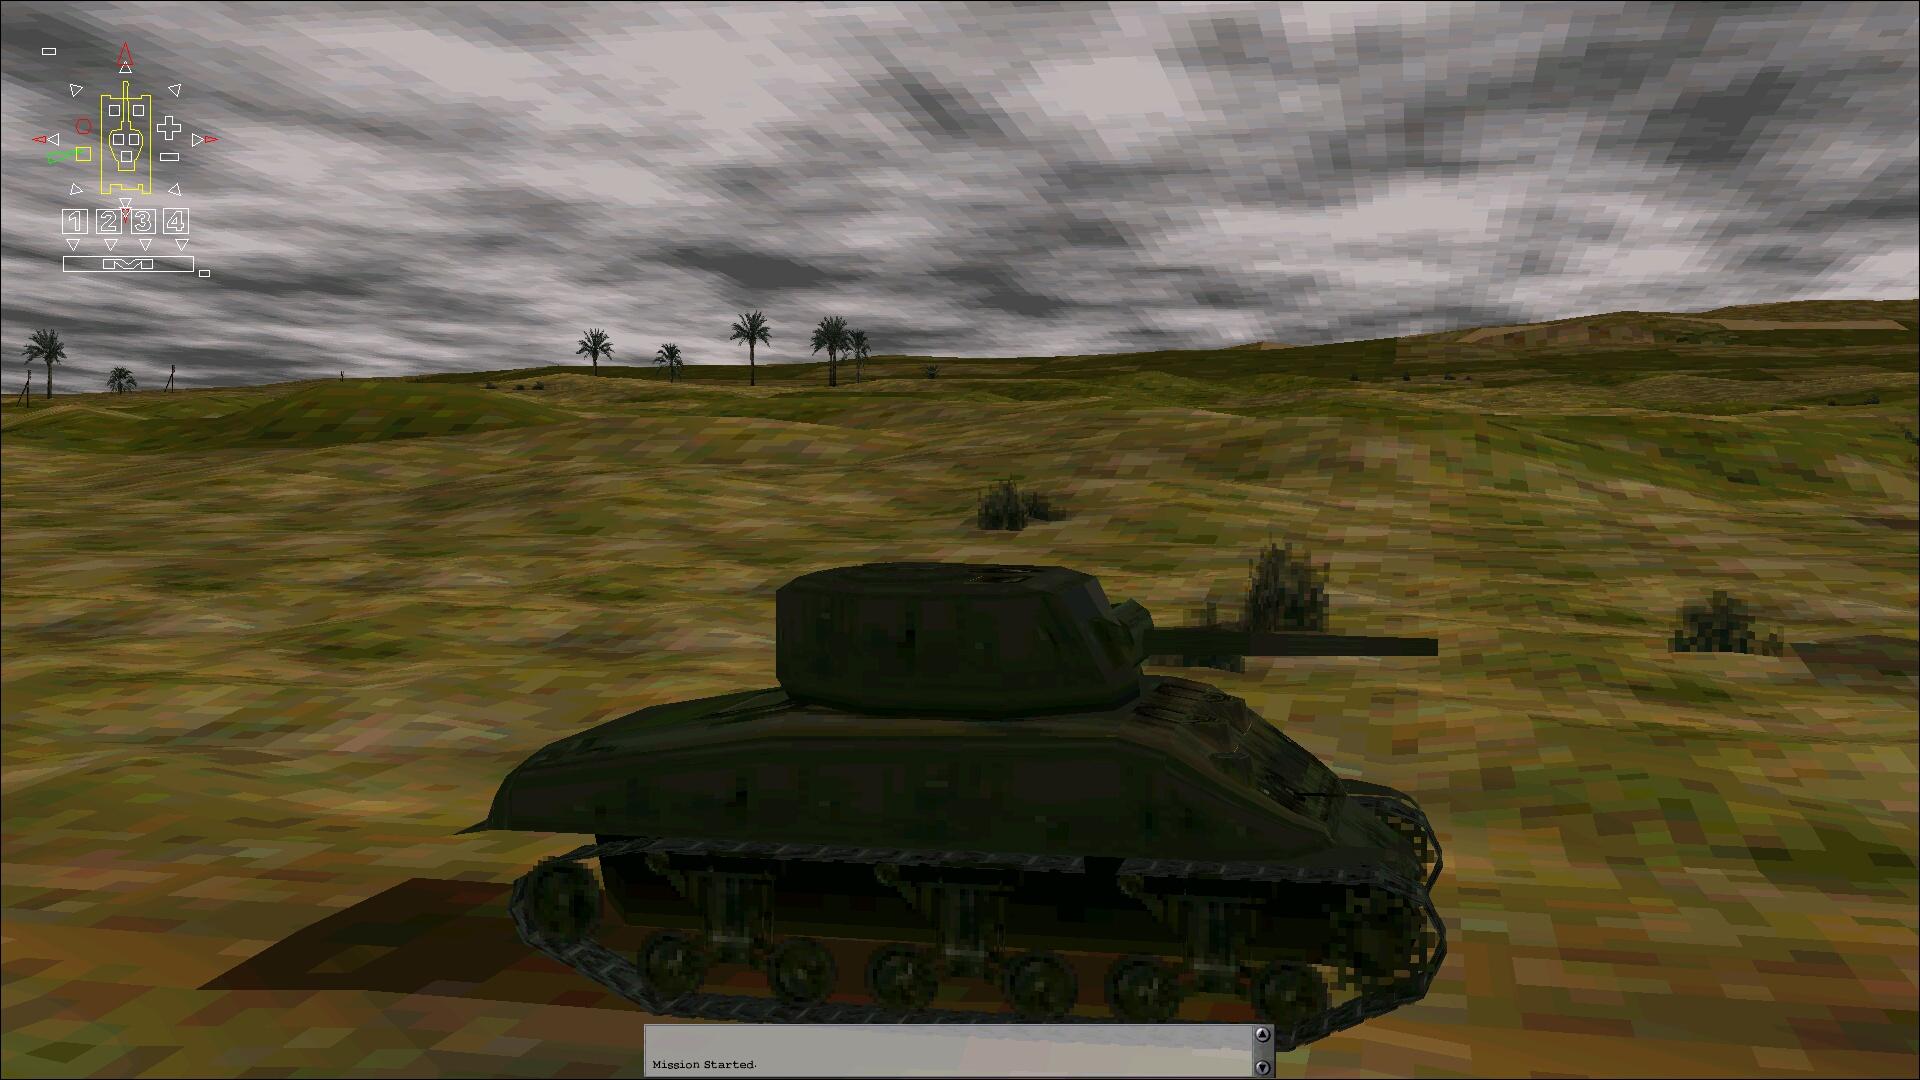 panzerelite91.jpg